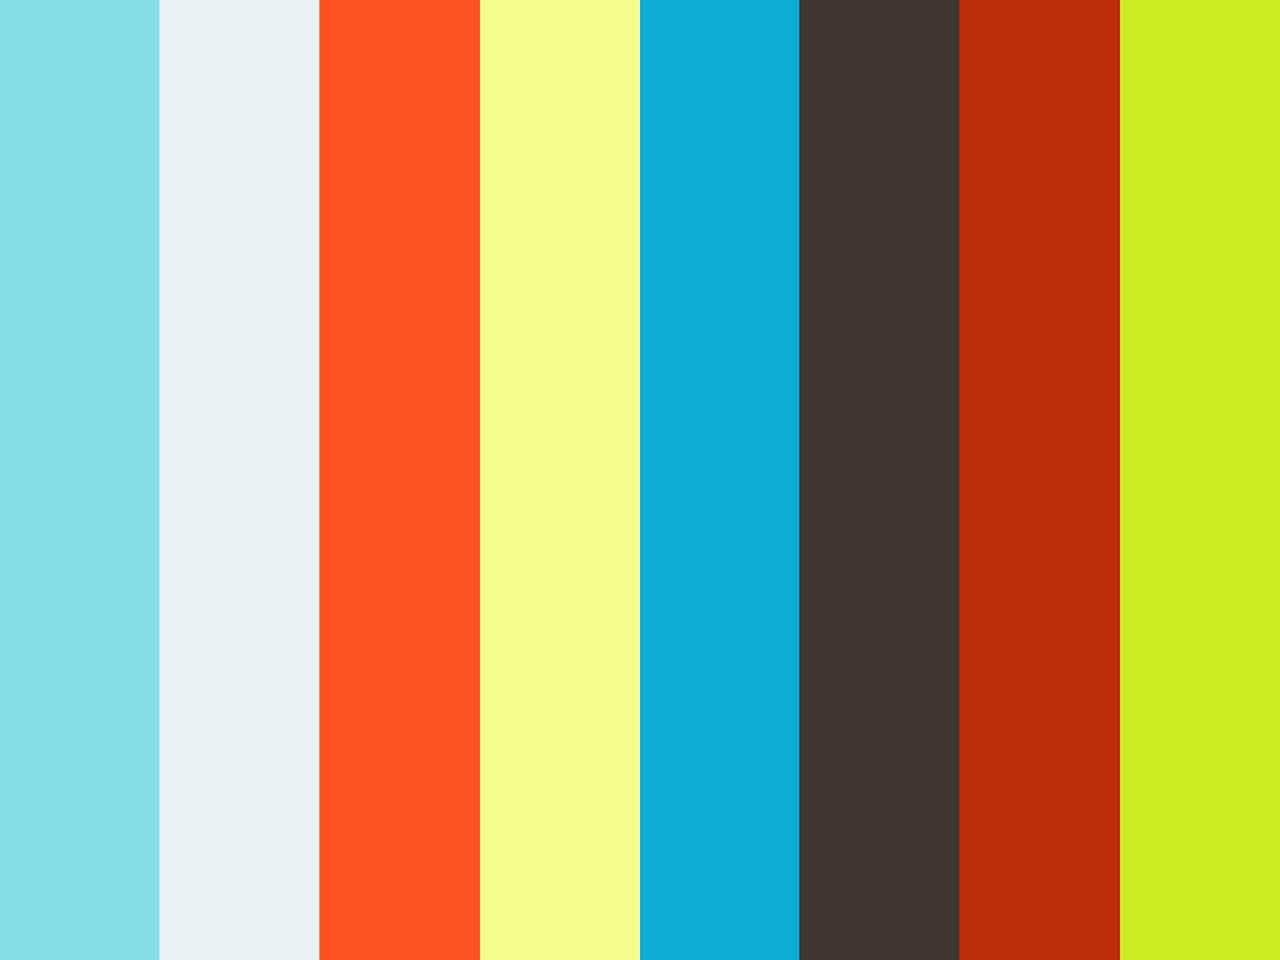 Dropmob-Red Barnet